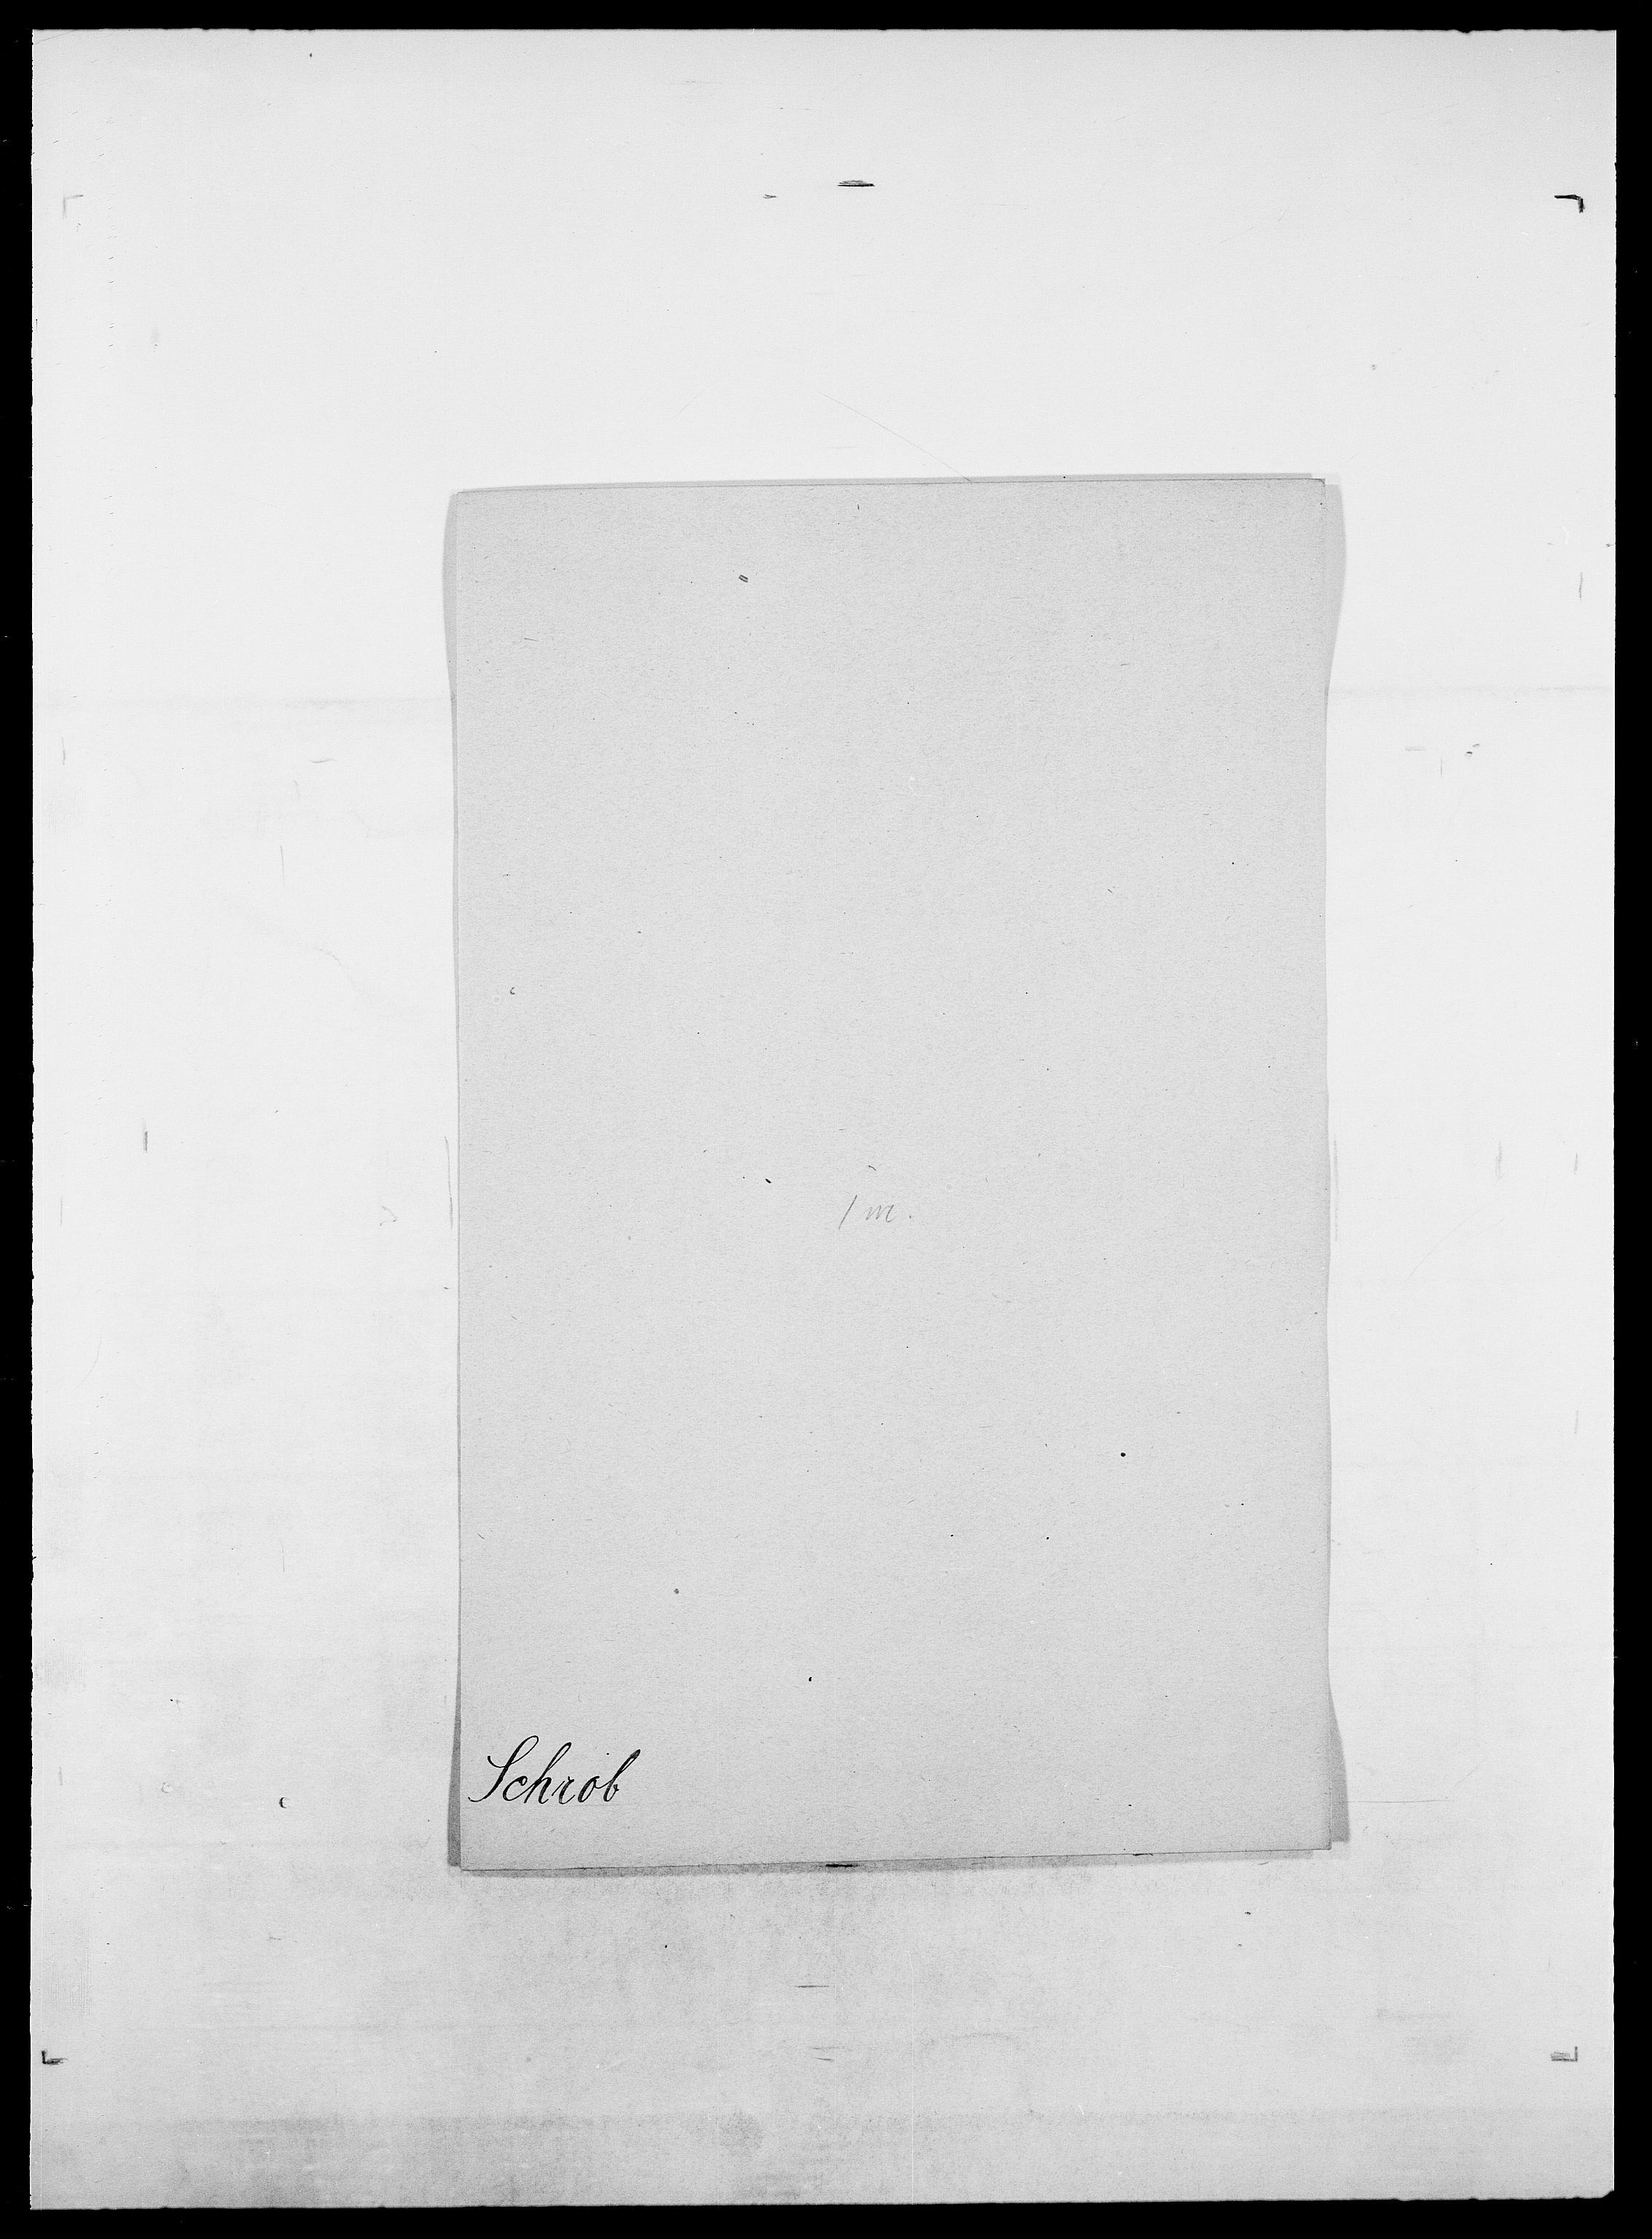 SAO, Delgobe, Charles Antoine - samling, D/Da/L0035: Schnabel - sjetman, s. 177